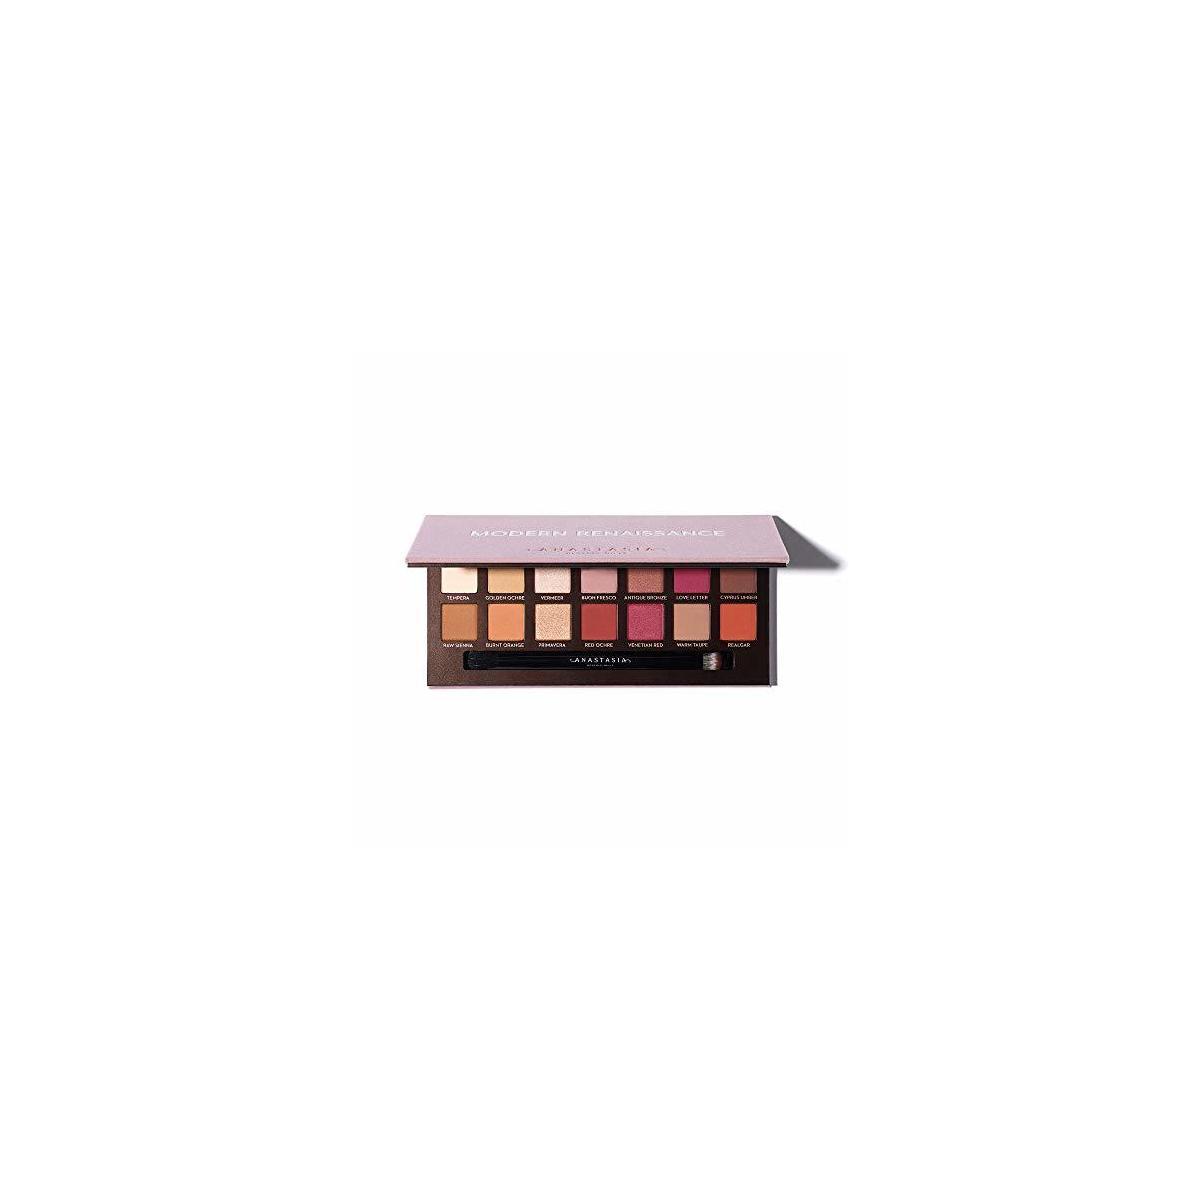 Anastasia Beverly Hills - Eyeshadow Palette - Soft Glam, Norvina, Modern Renaissance